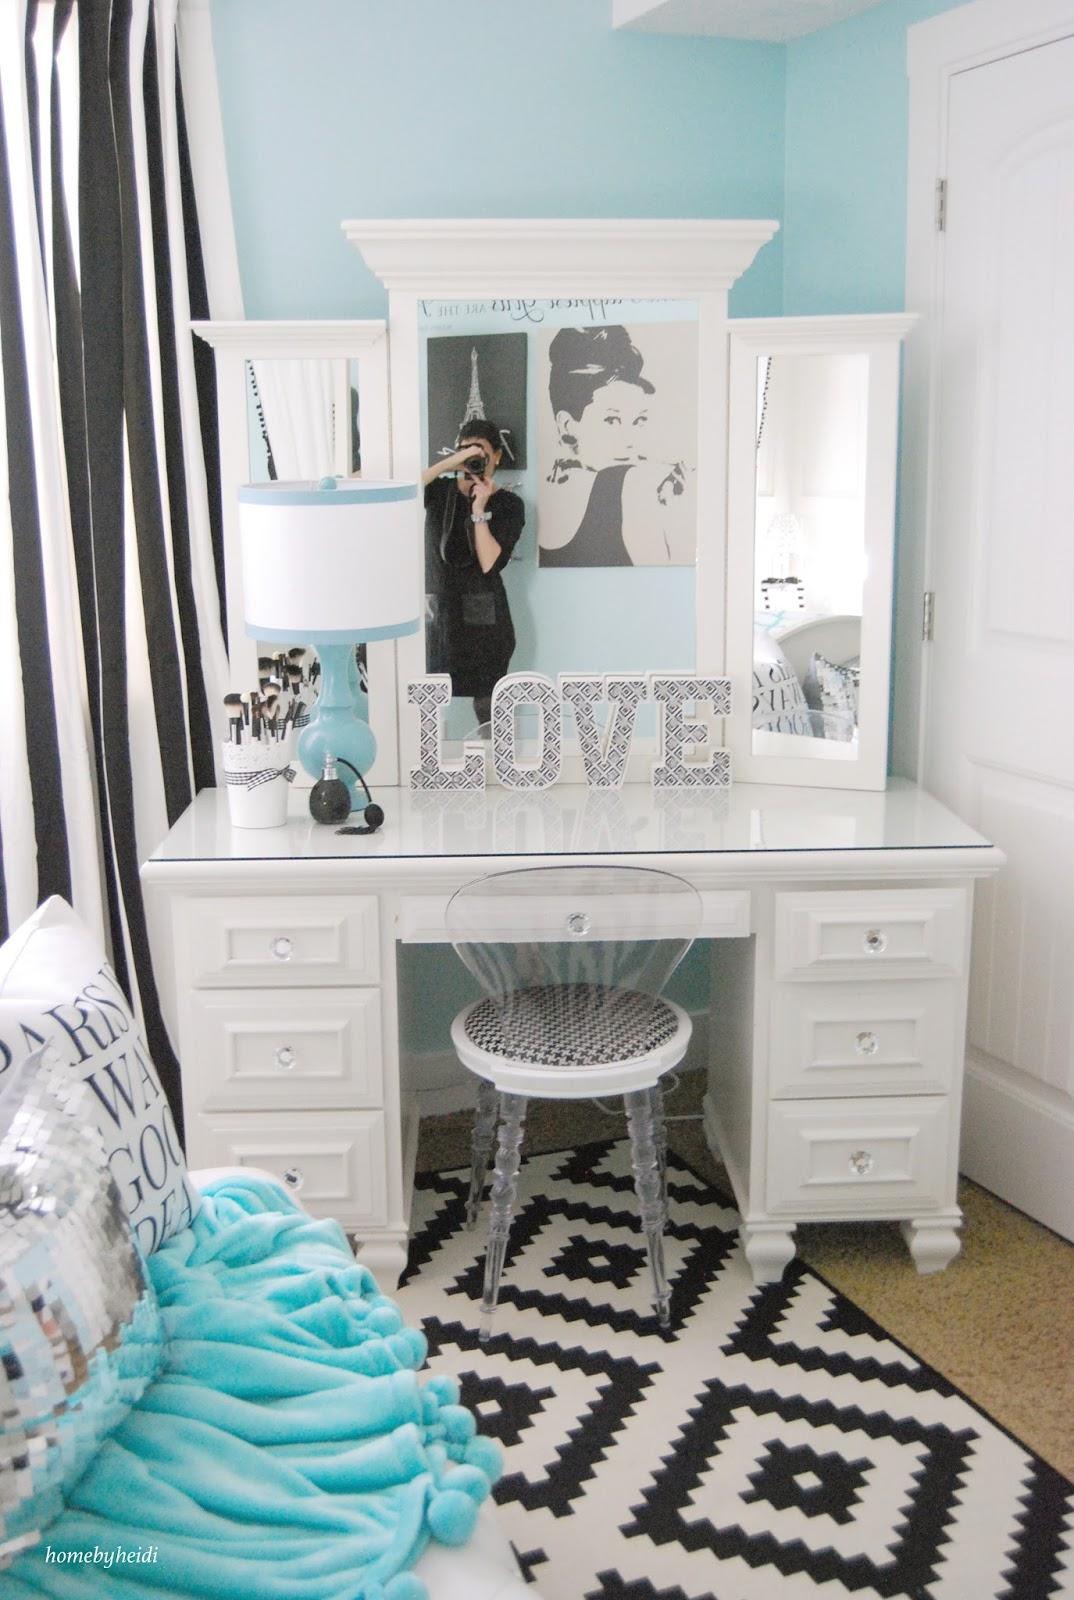 Home By Heidi: Tiffany Inspired Bedroom